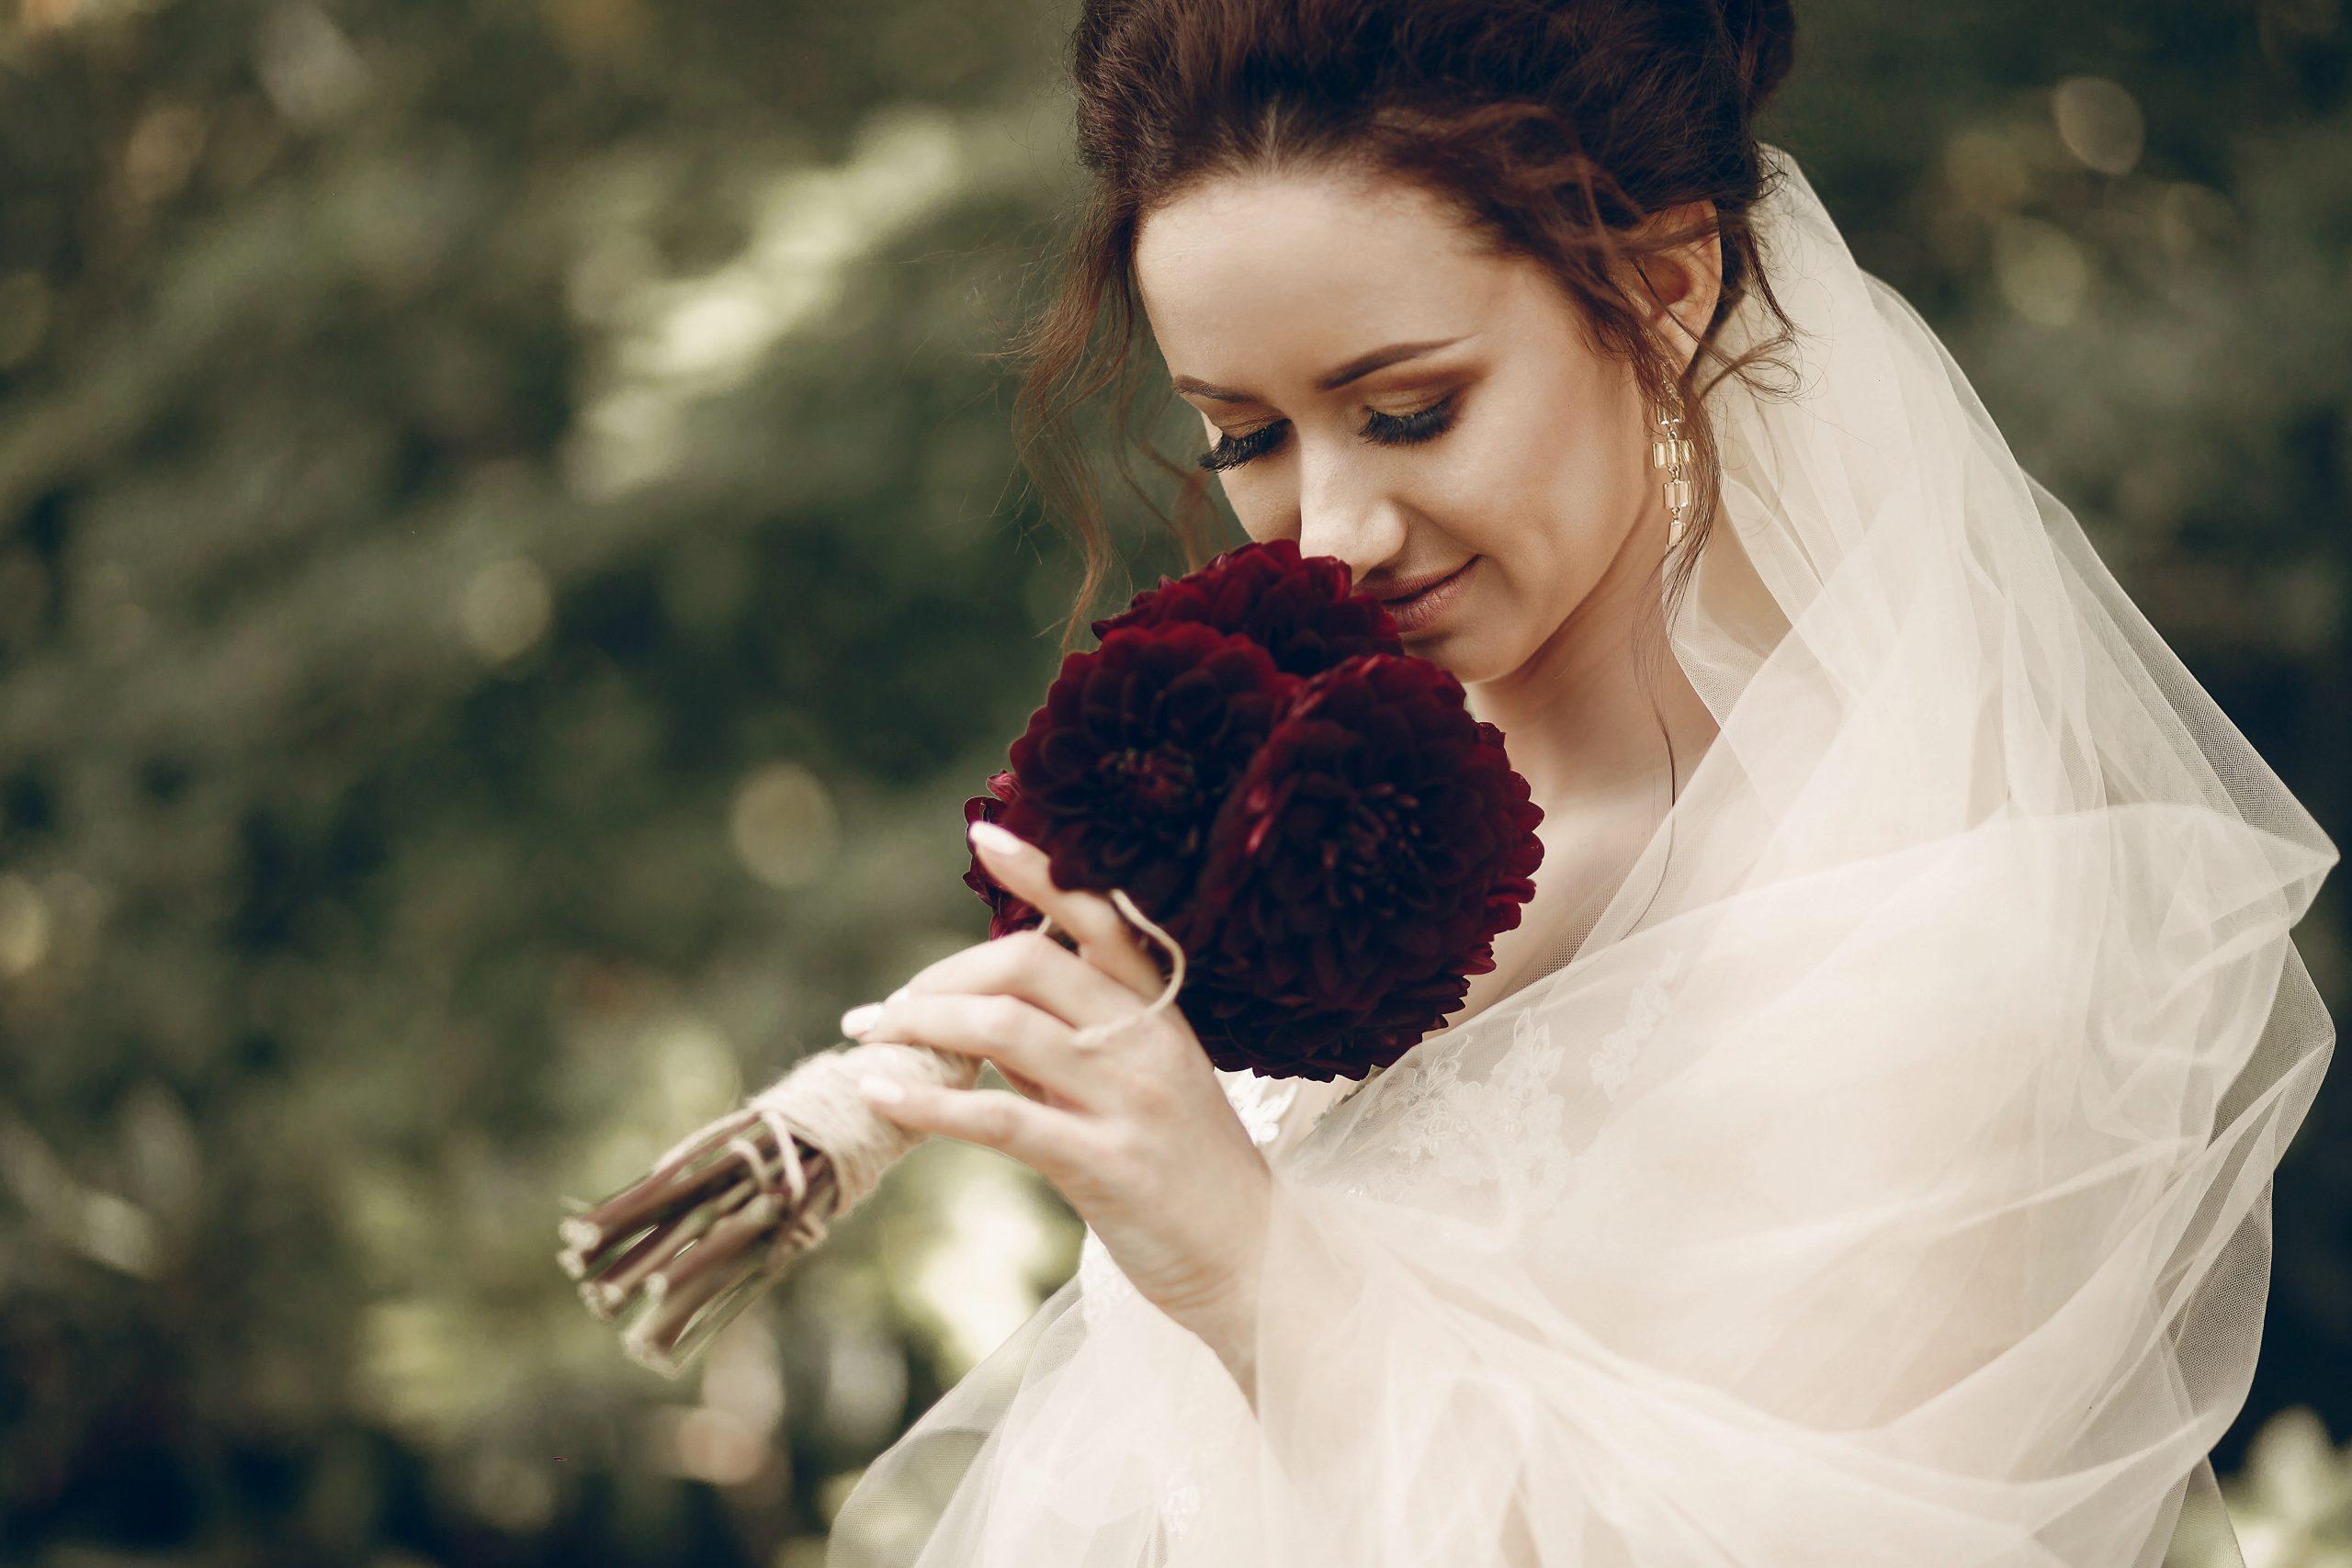 Vintage wedding dresses | Secondhand wedding dresses australia